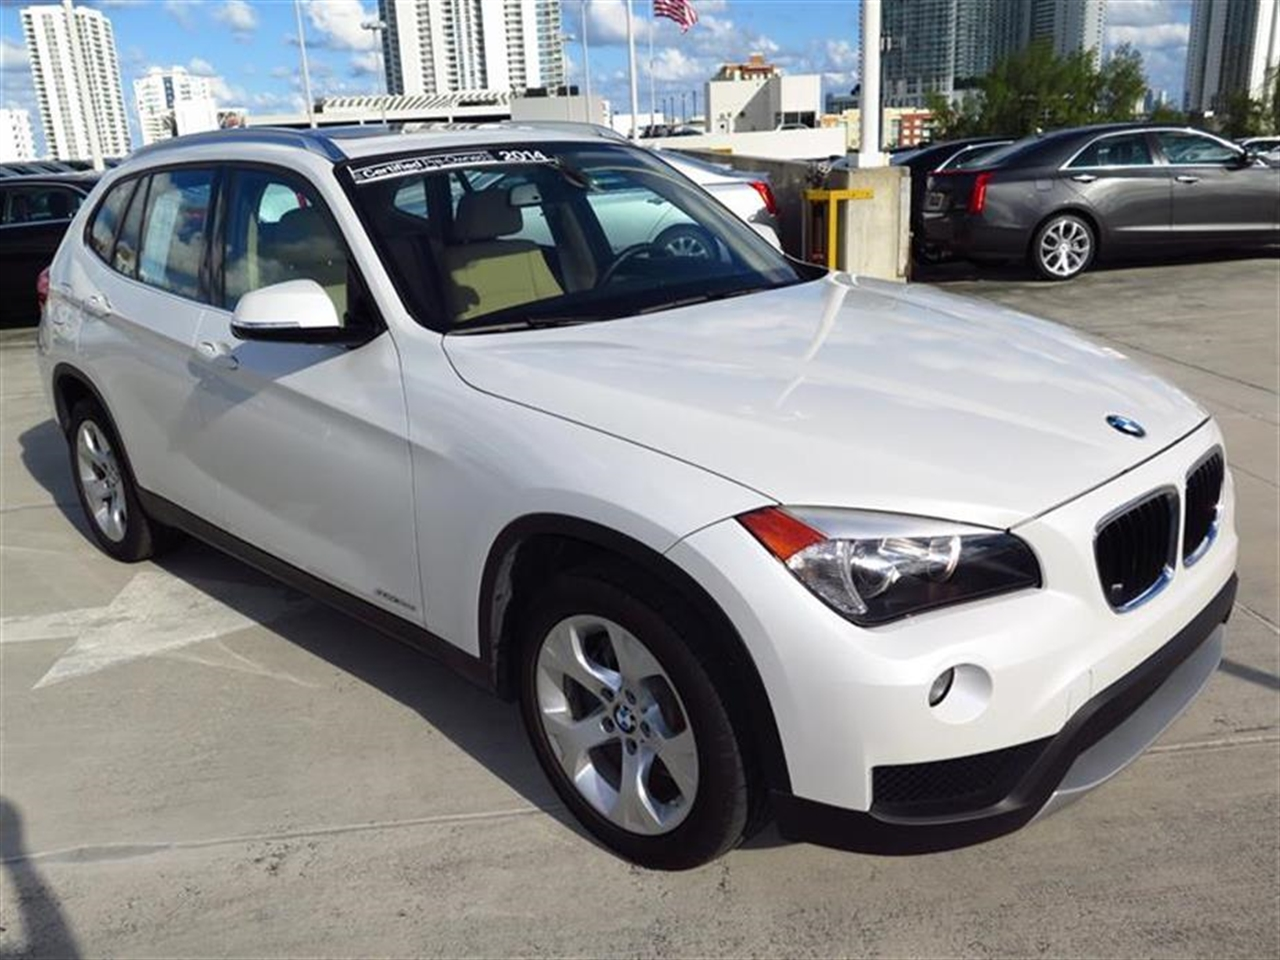 2014 BMW X1 RWD 4dr sDrive28i 10505 miles VIN WBAVM1C57EVW48806